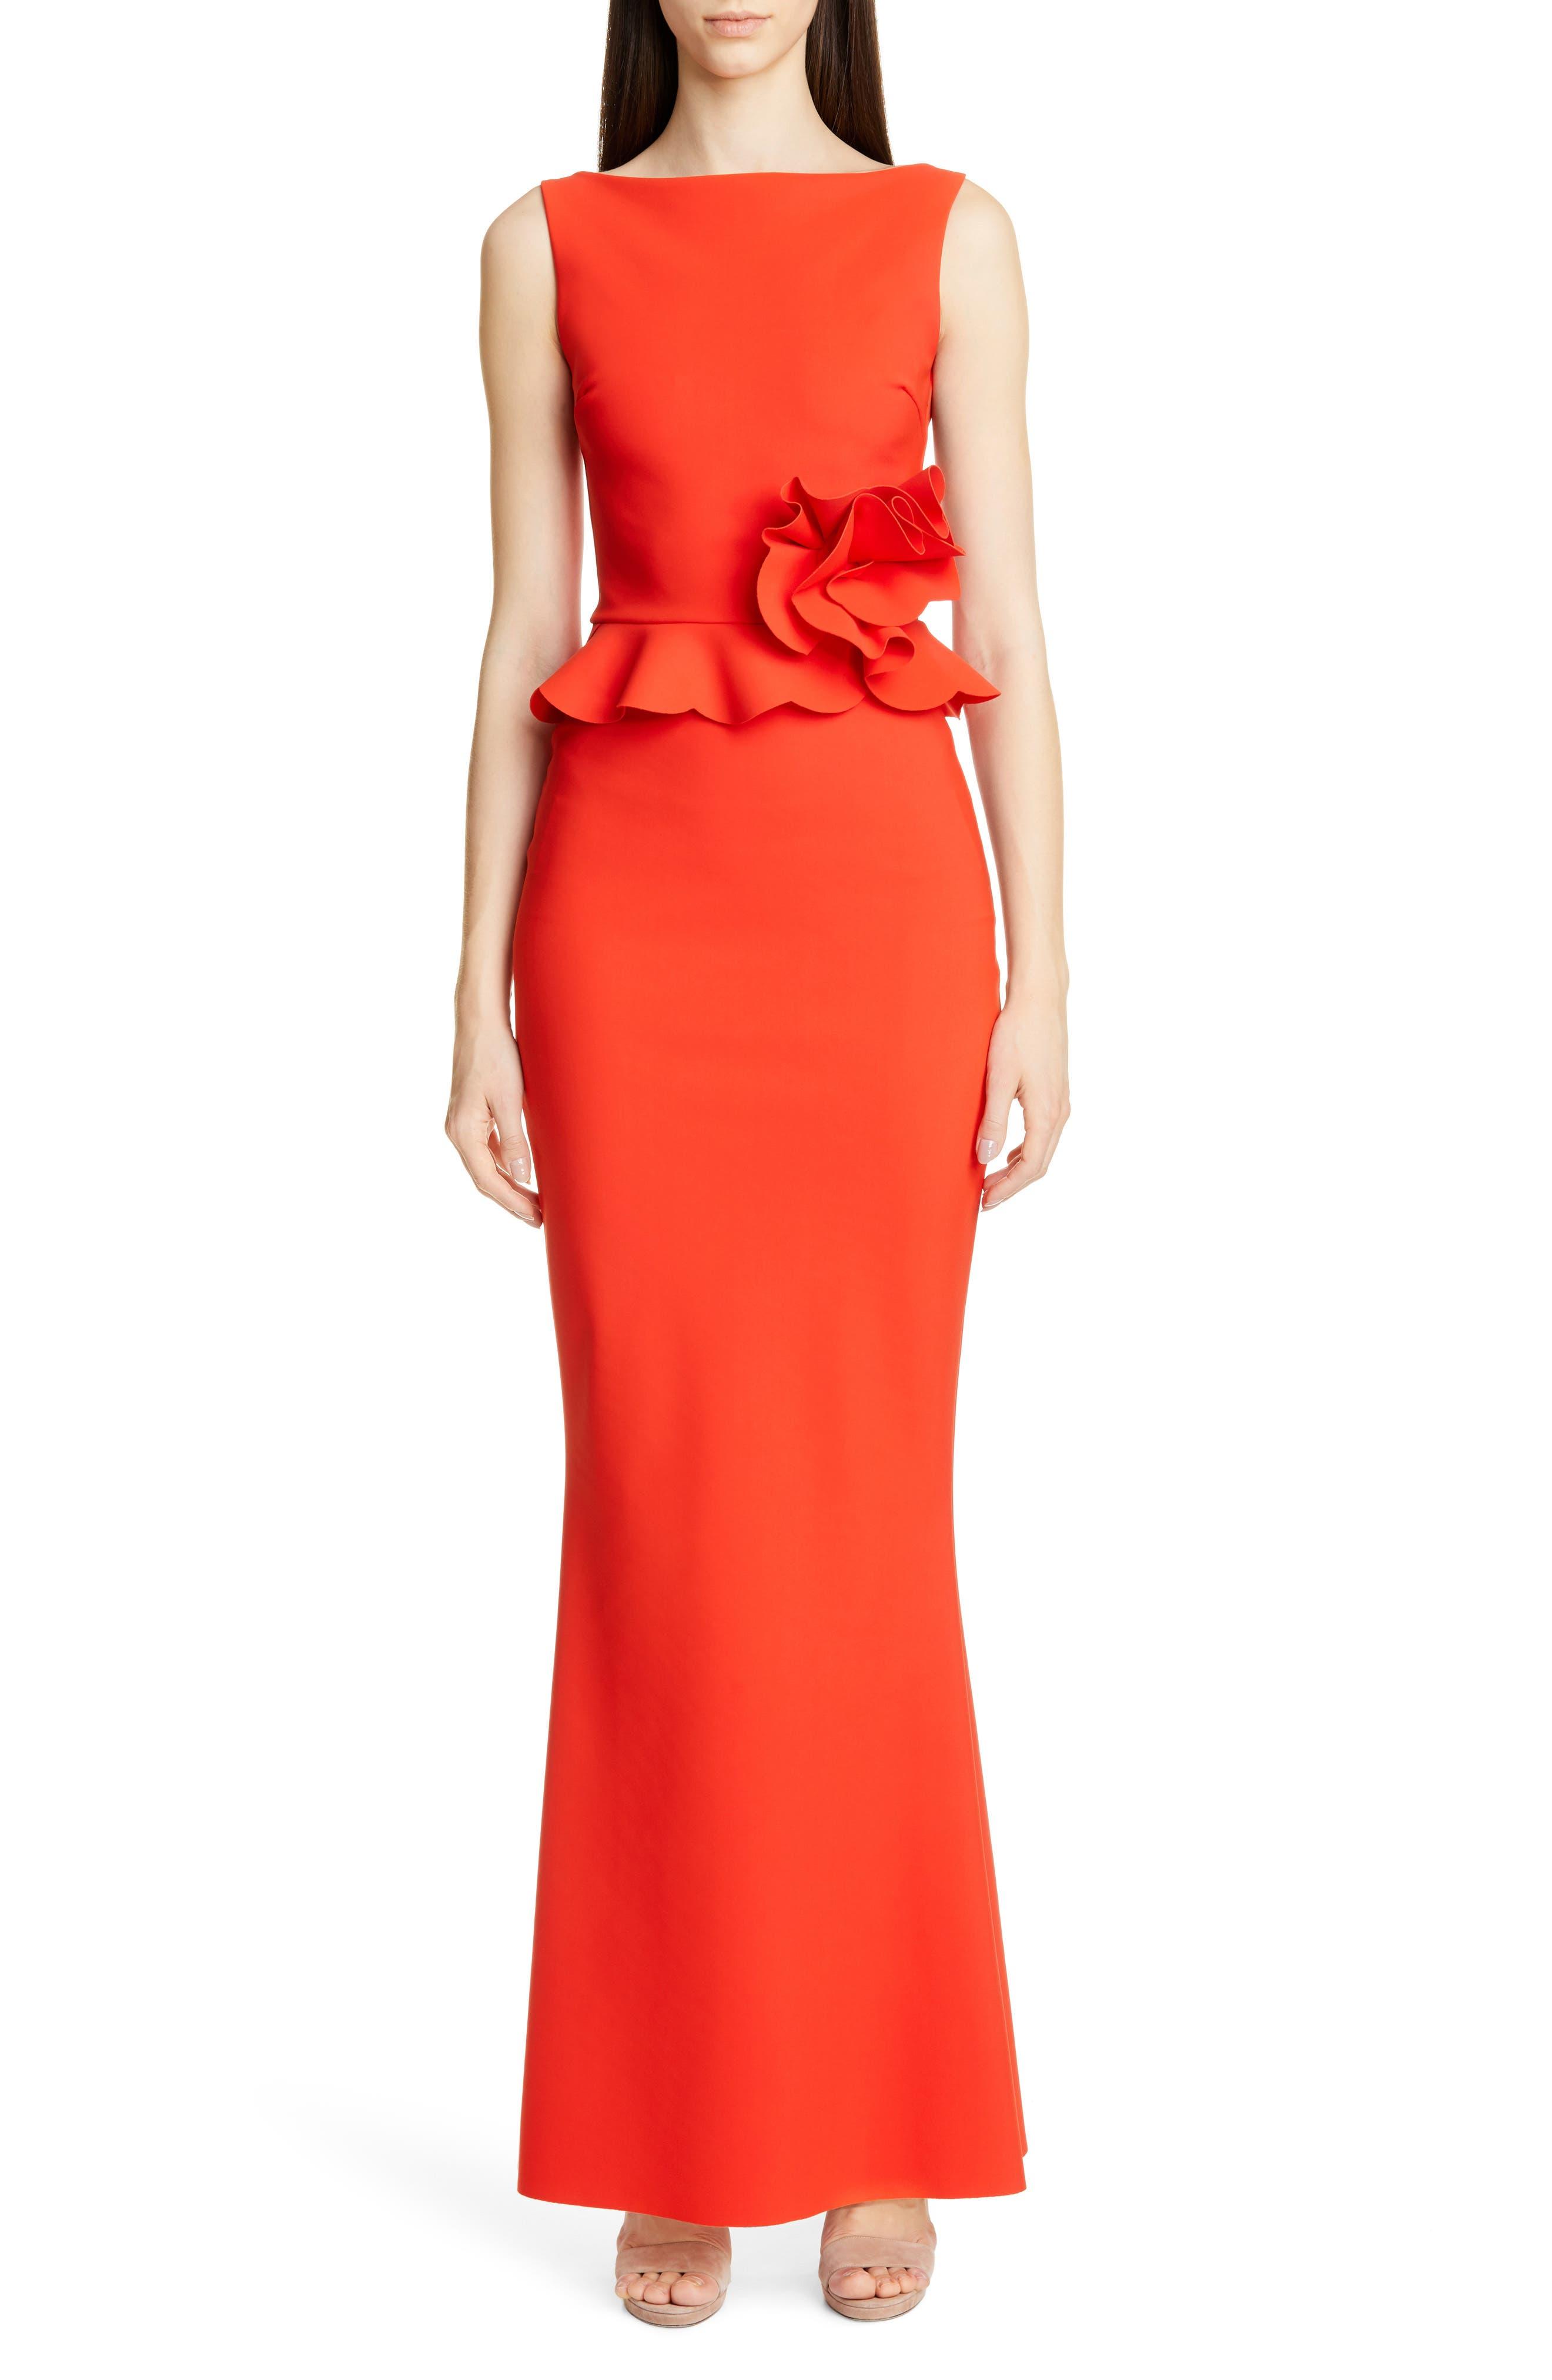 Chiara Boni La Petite Robe Side Ruffle Evening Dress, 50 IT - Red